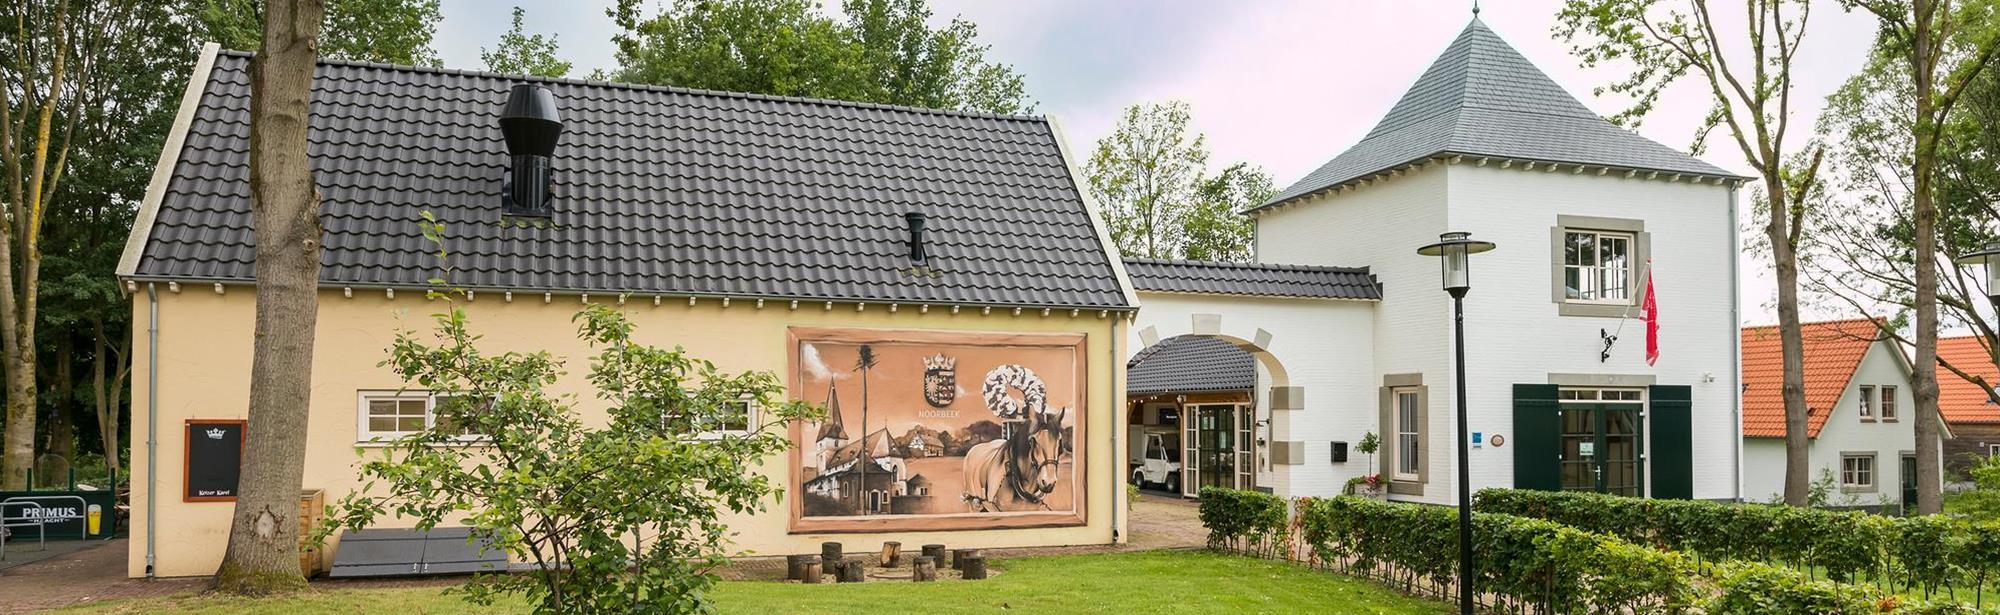 Visit Zuid-Limburg Servicepunt Landal de Waufsberg